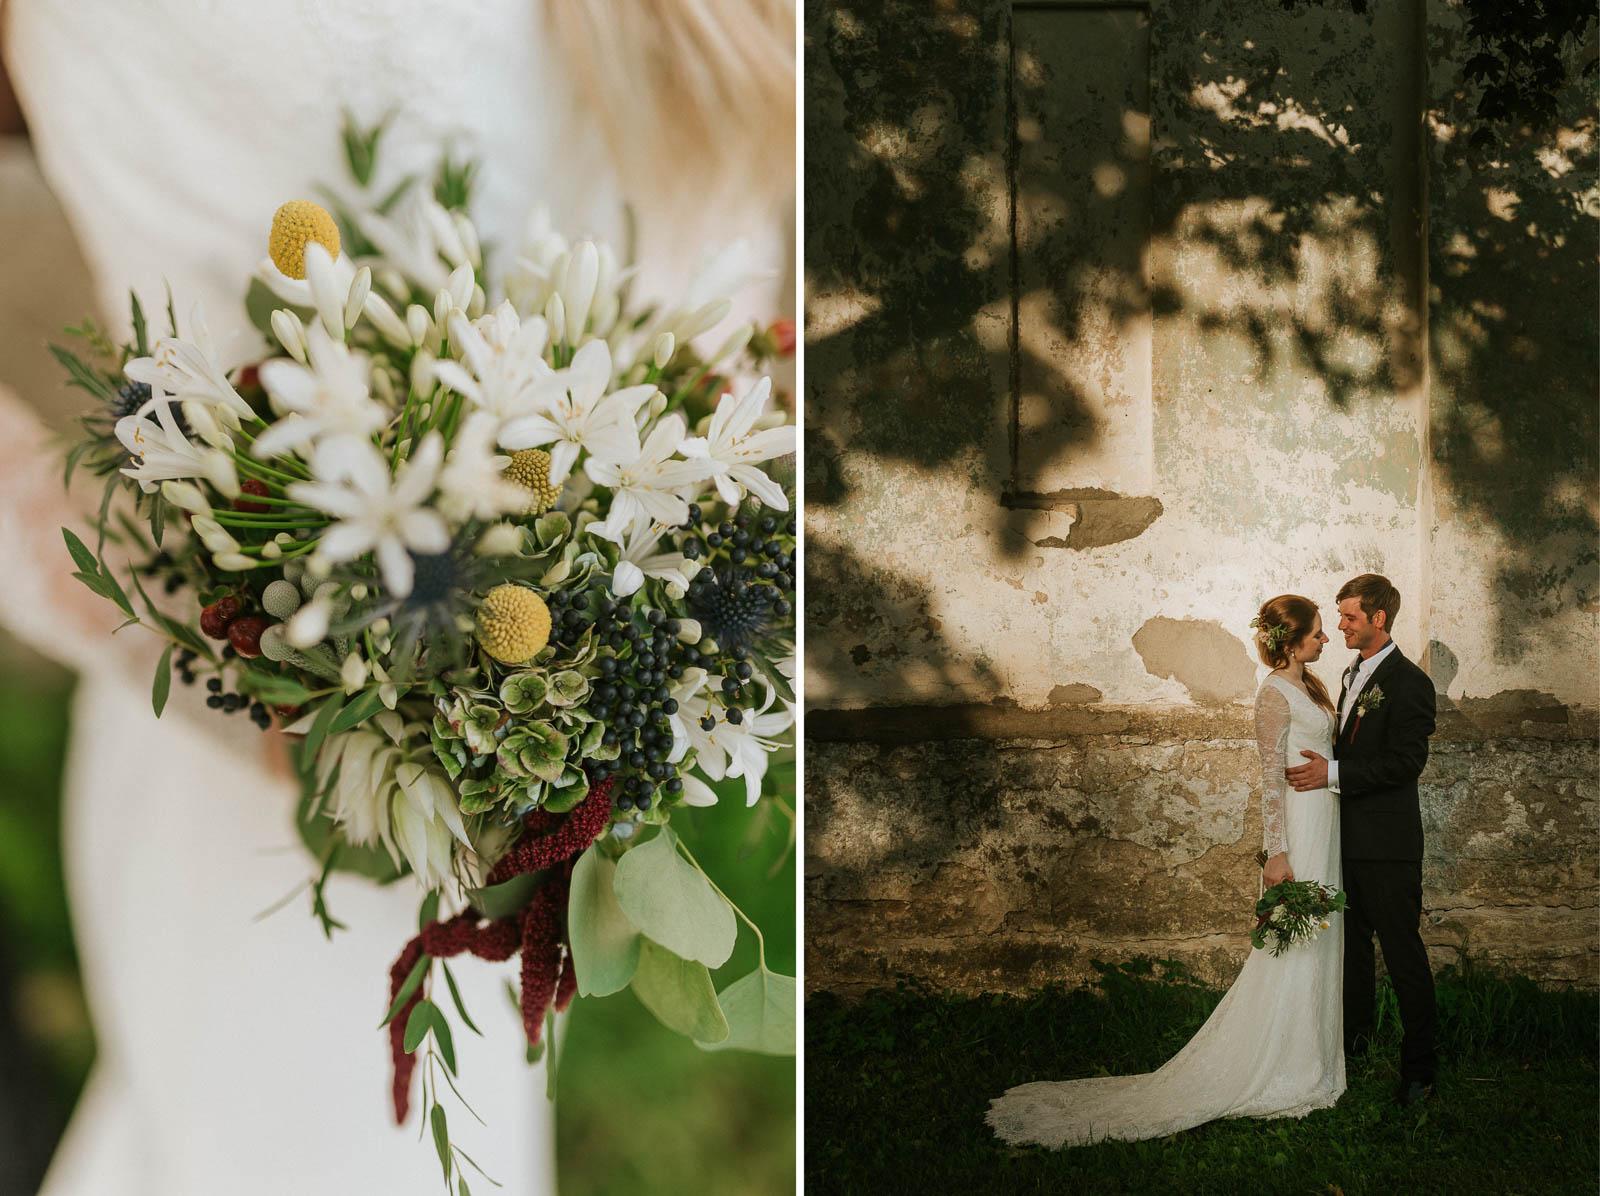 Pohjaka_mois_manor_pulm_wedding_Mait_Juriado-25